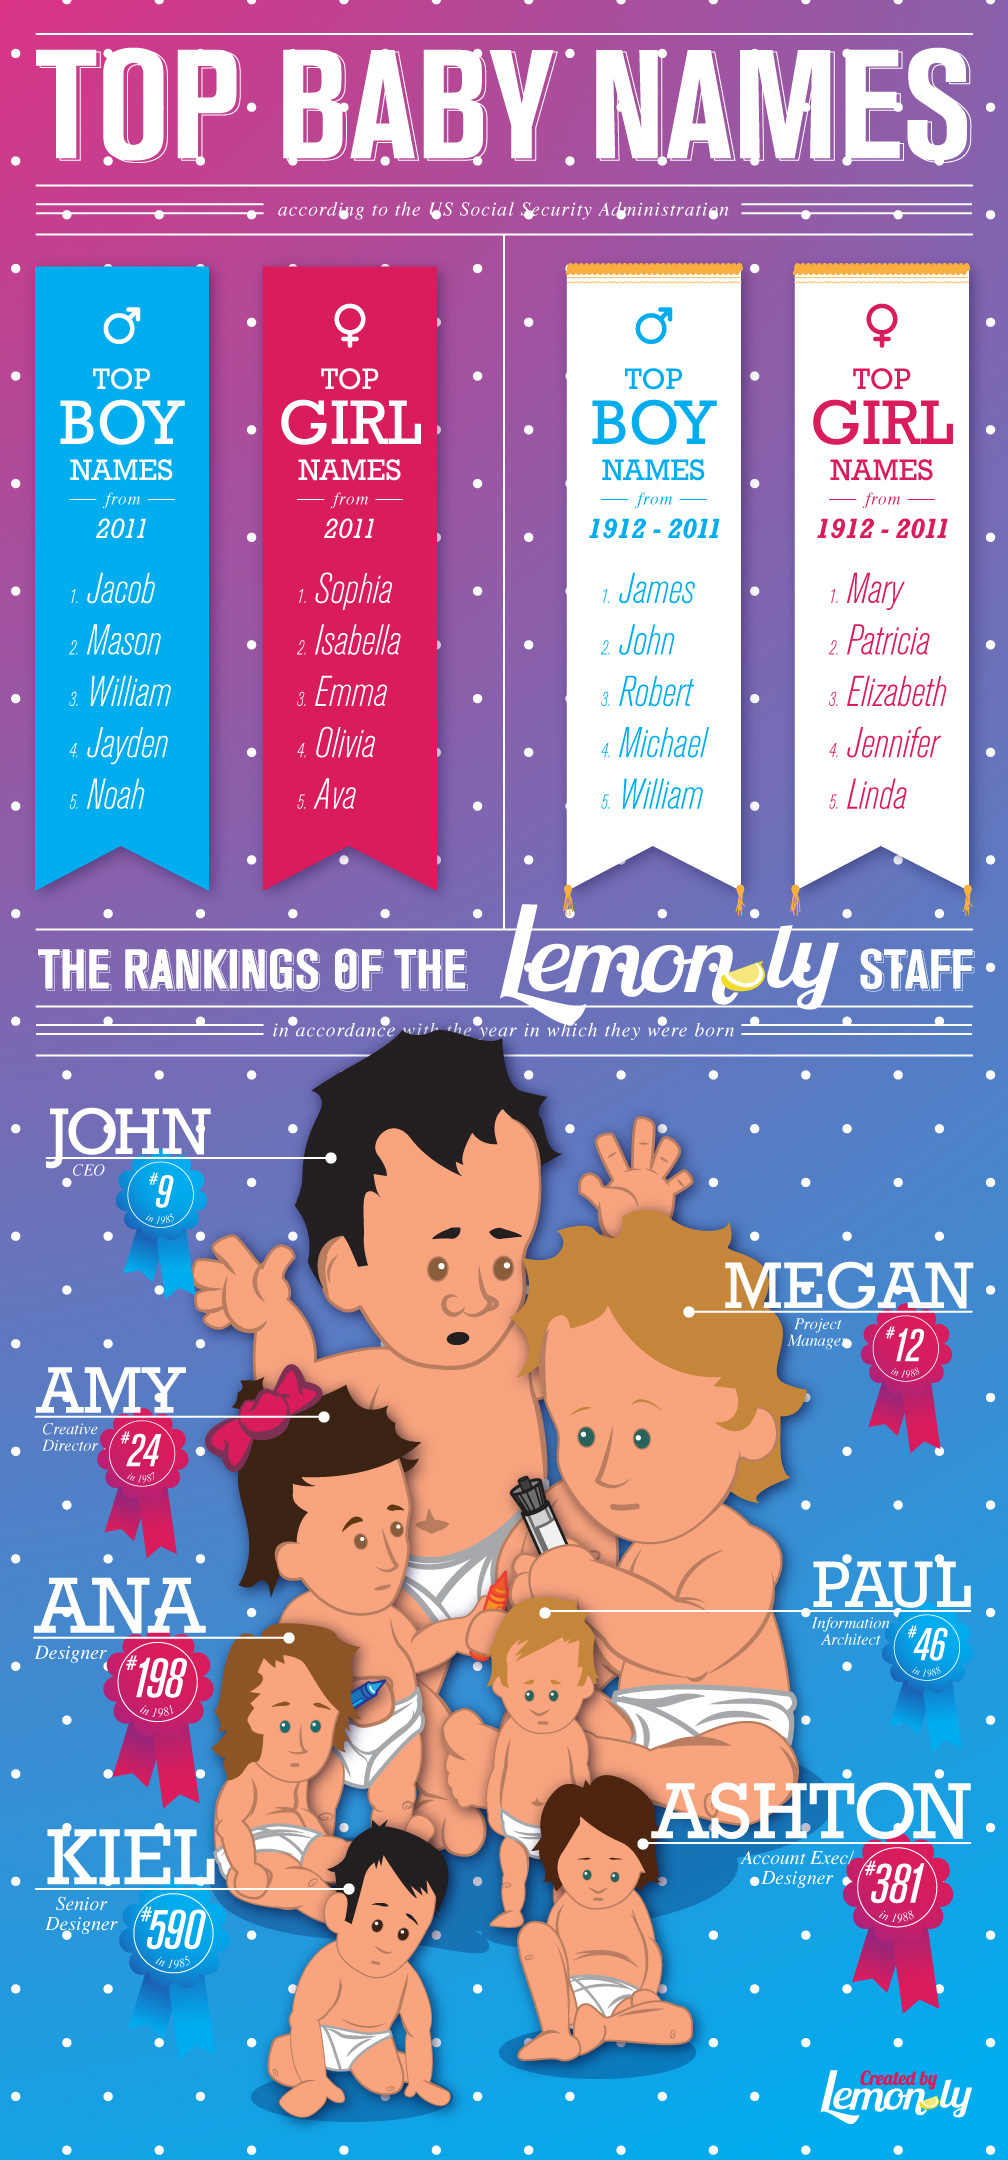 Top Baby Names In 2011